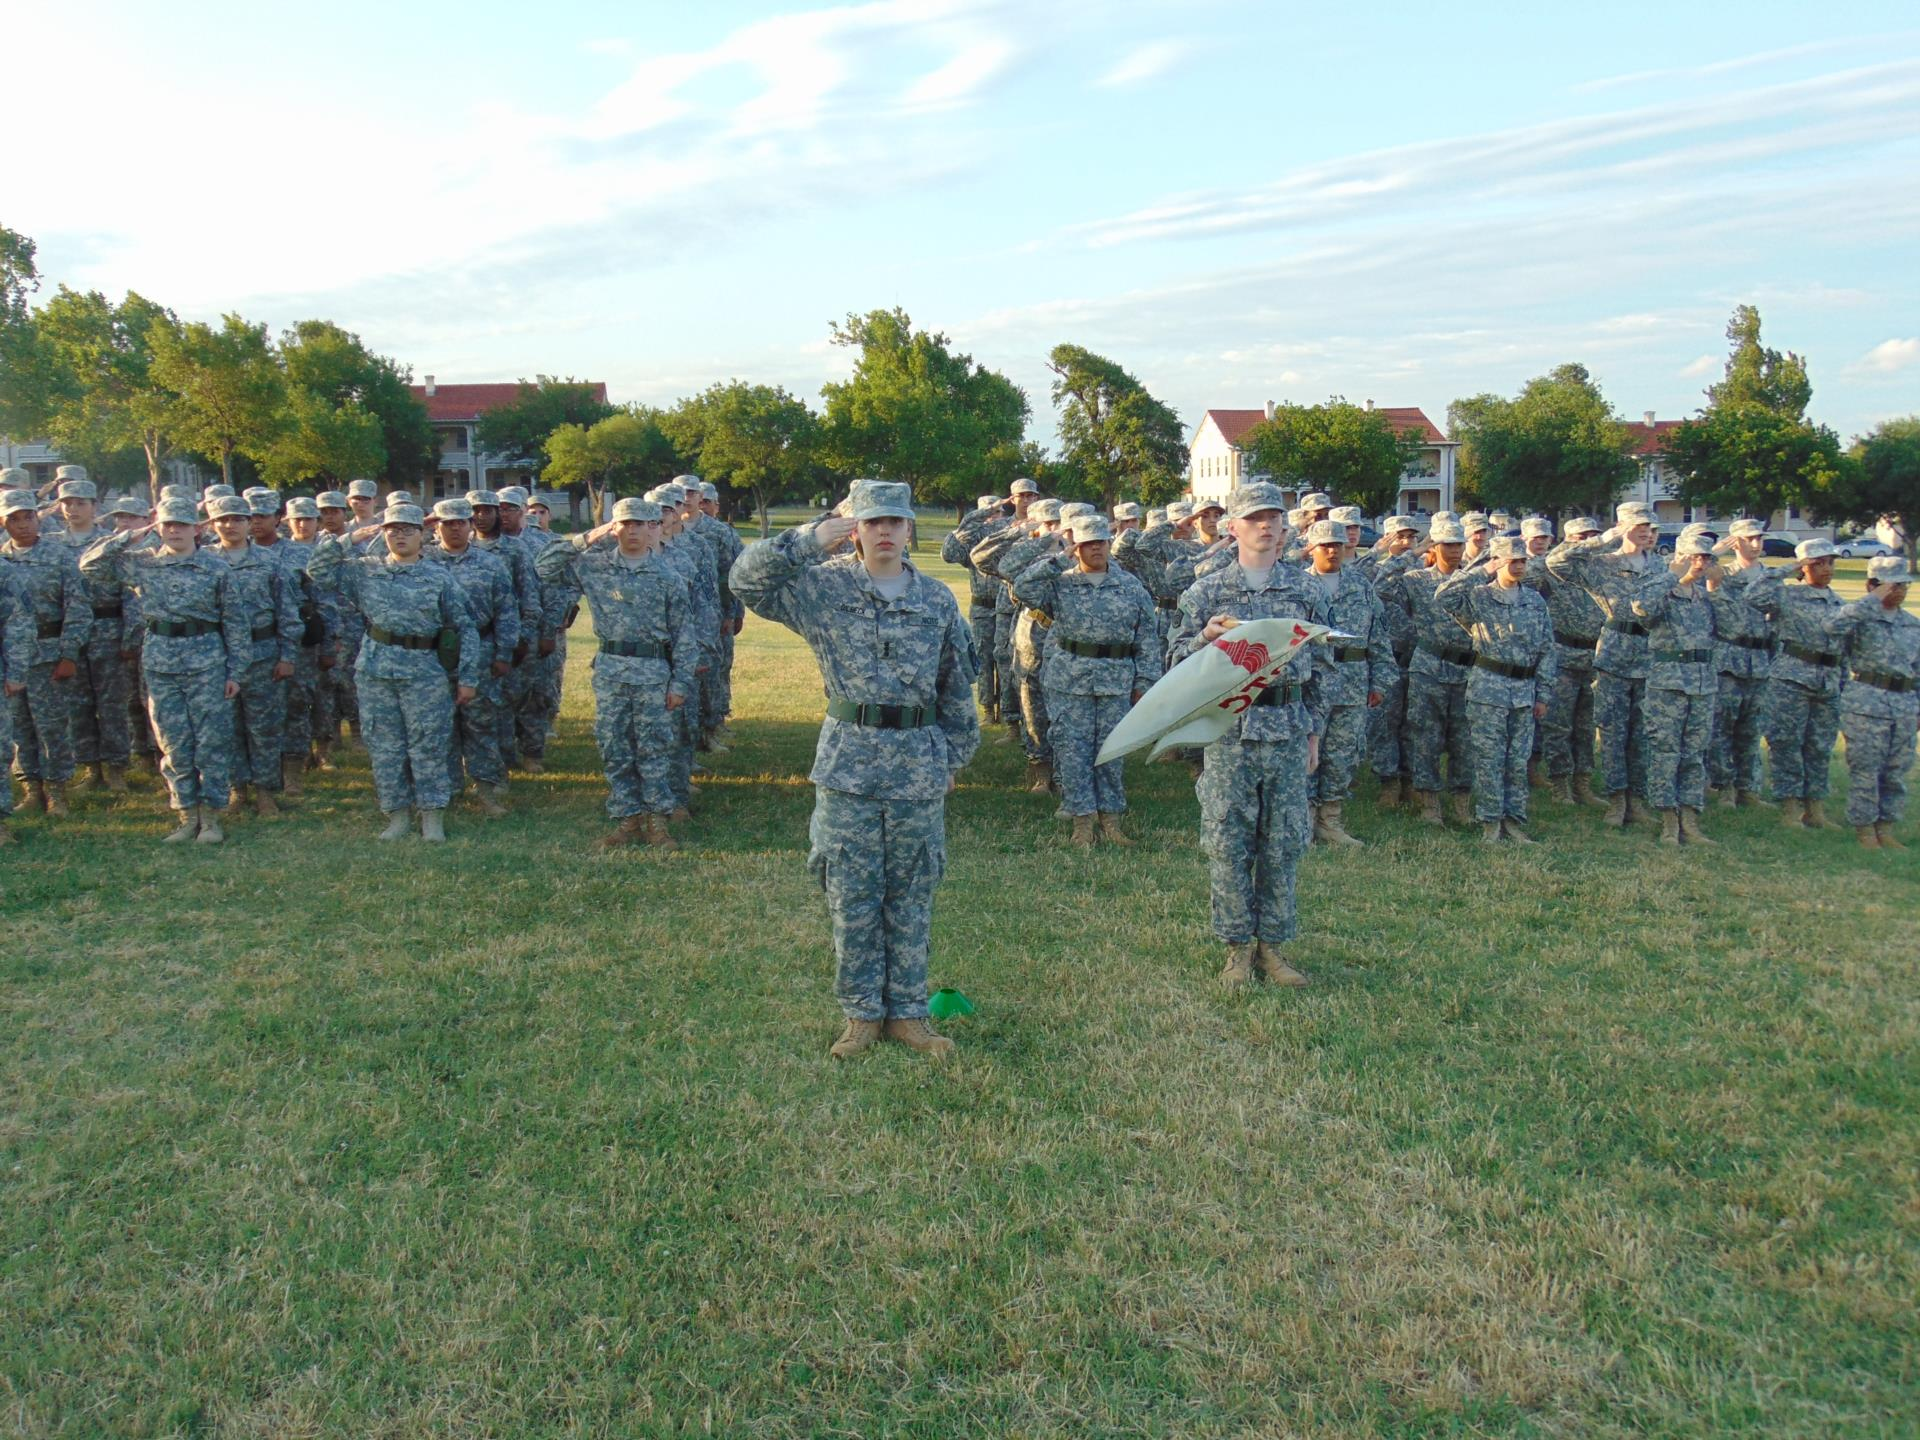 Emma Dilbeck leads platoon